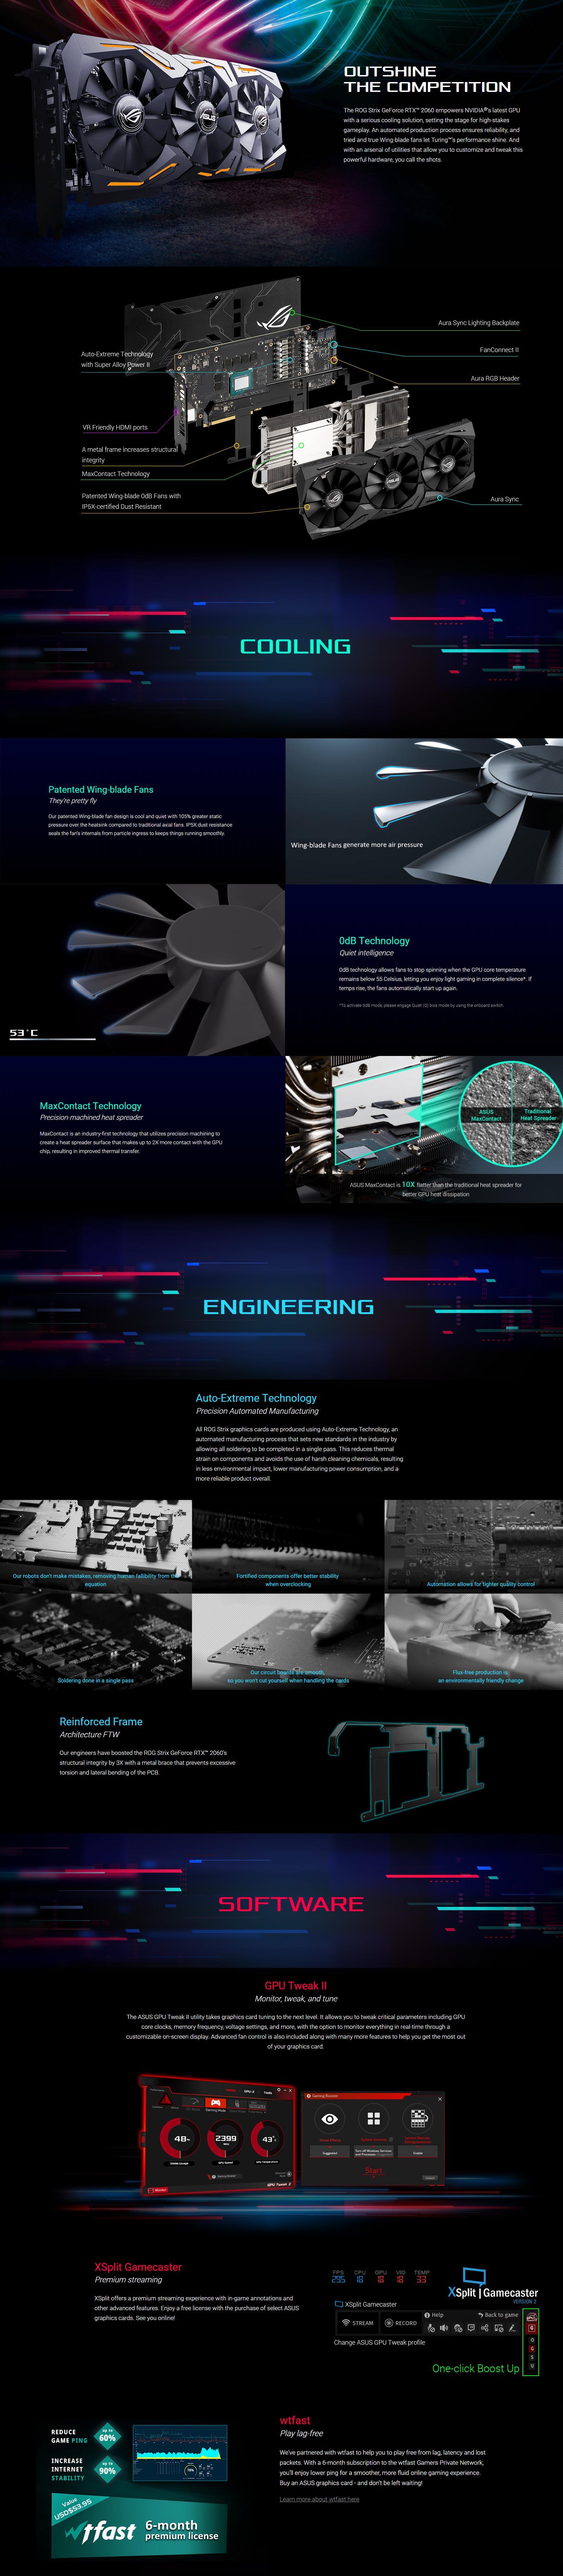 Asus GeForce RTX 2060 ROG Strix Gaming 6G OC Graphics Card